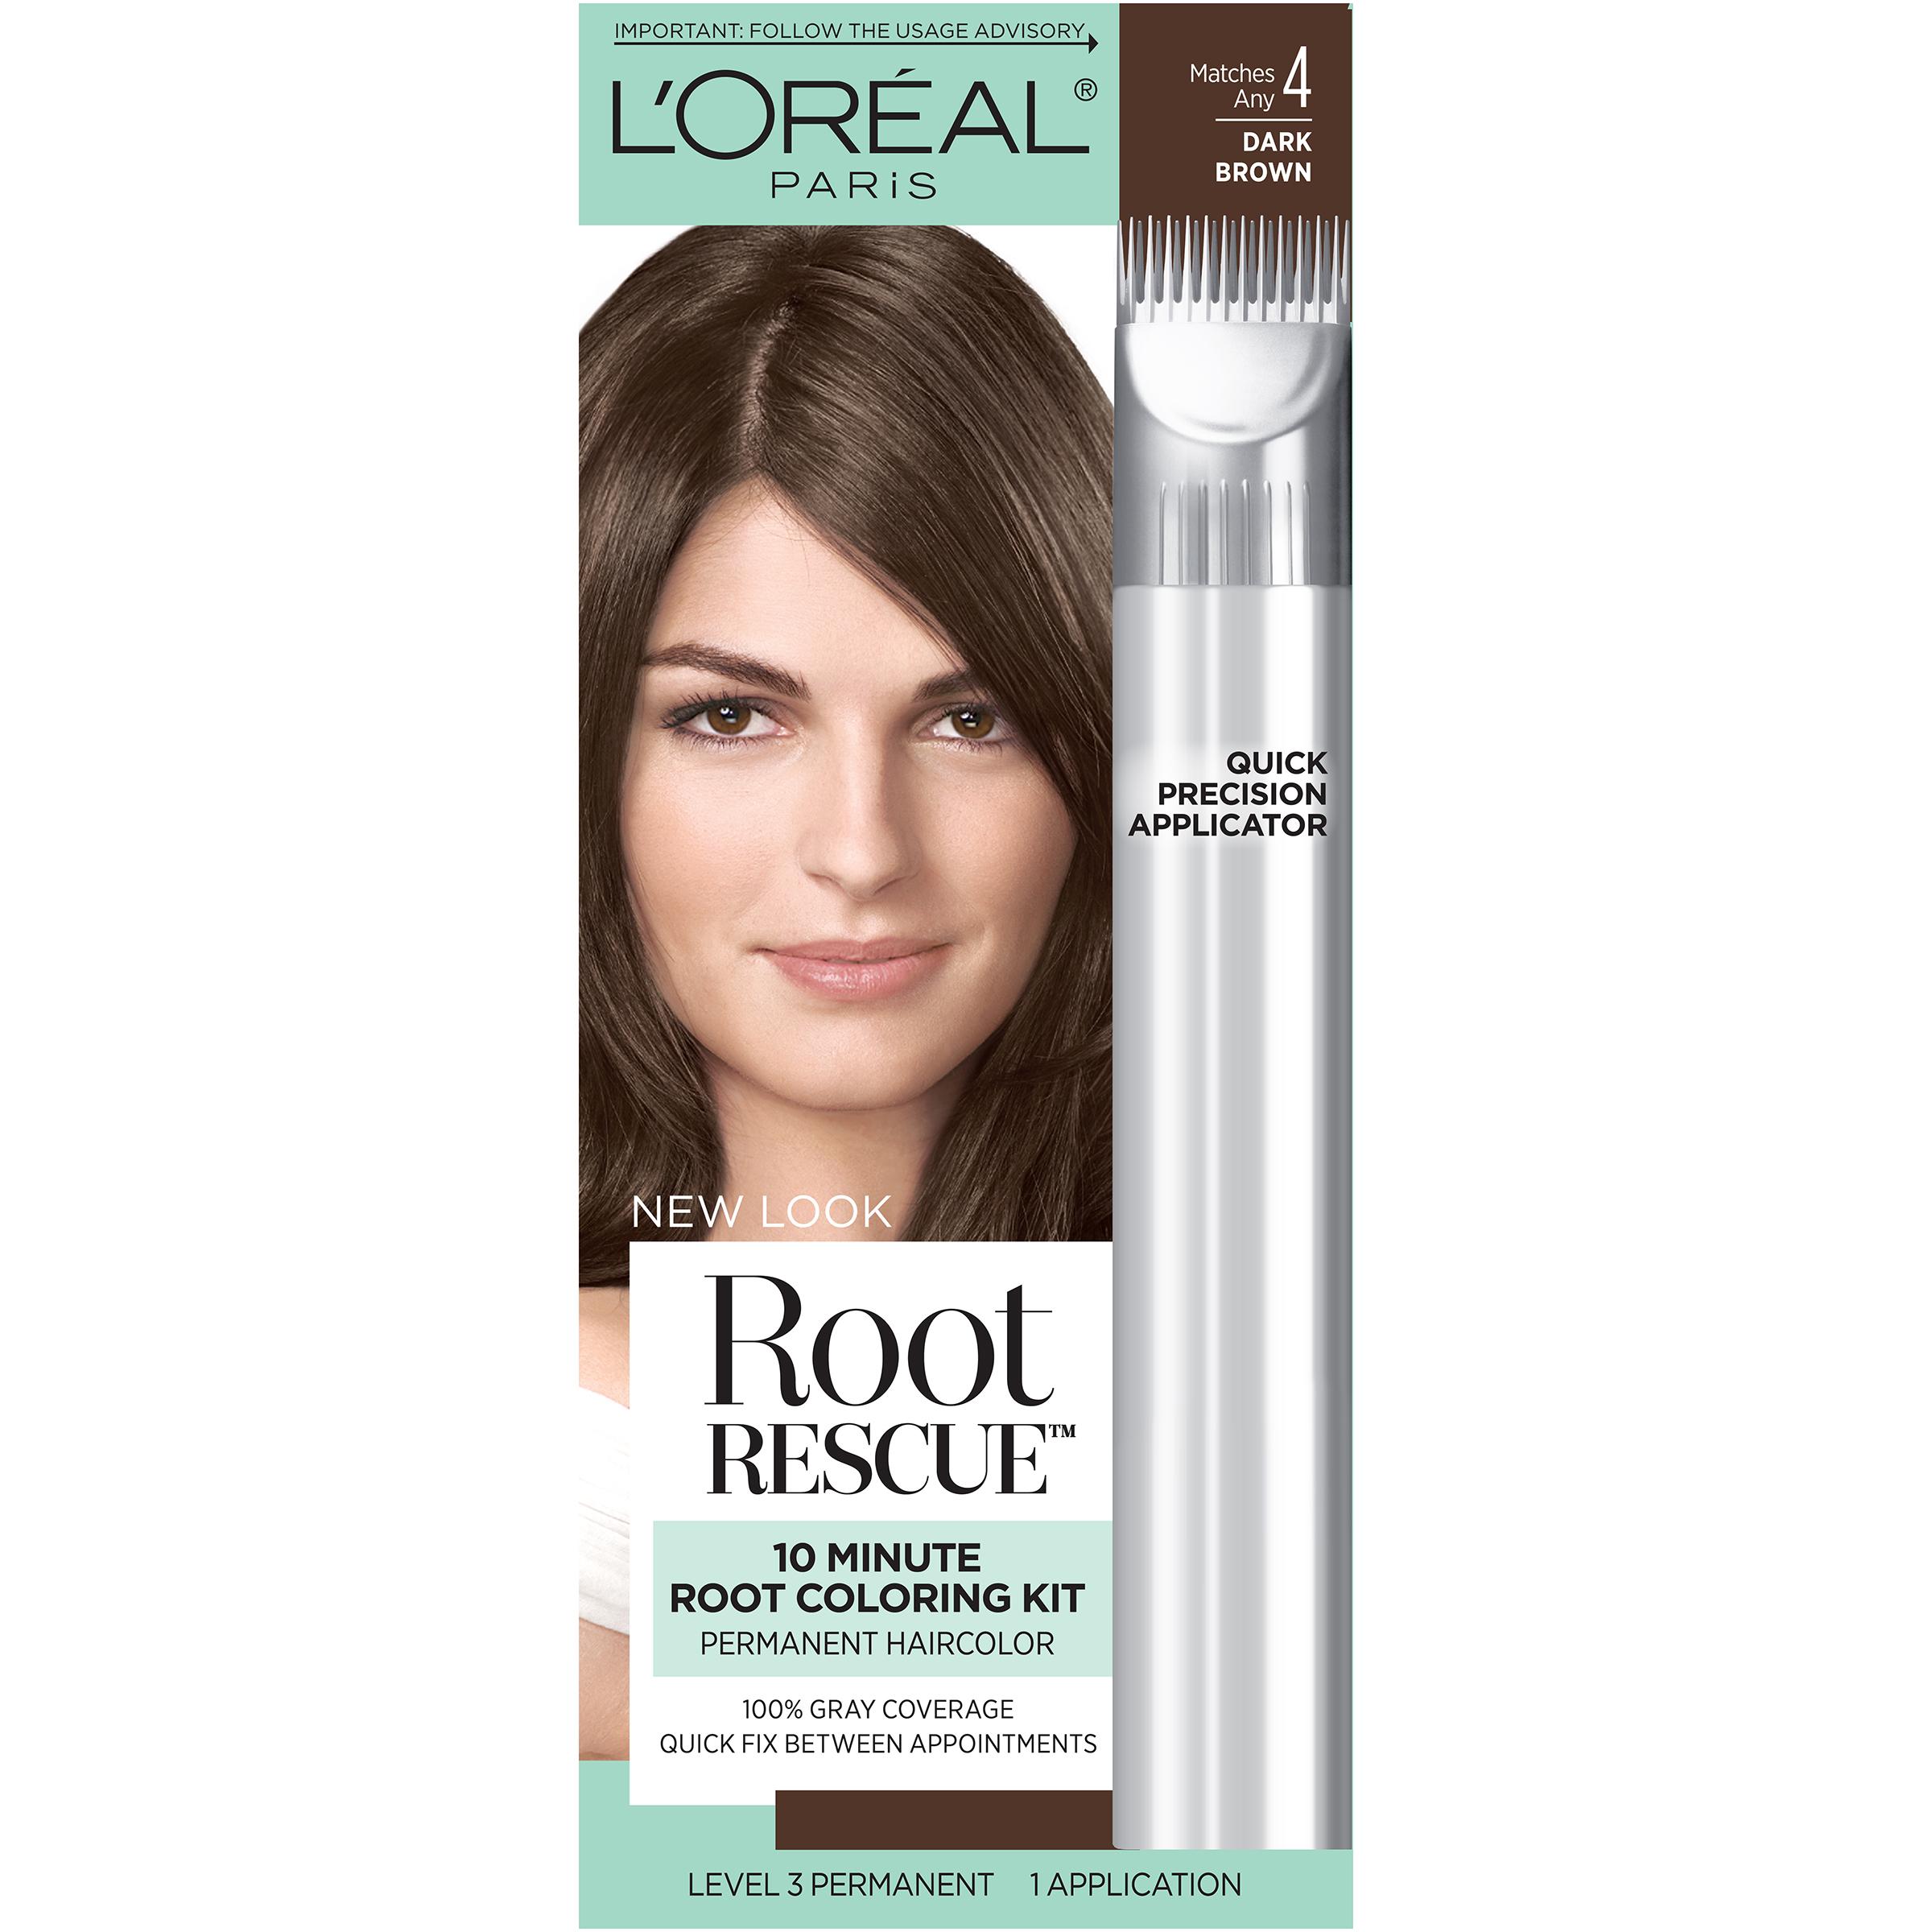 Loral Paris Root Rescue Hair Color Ebay